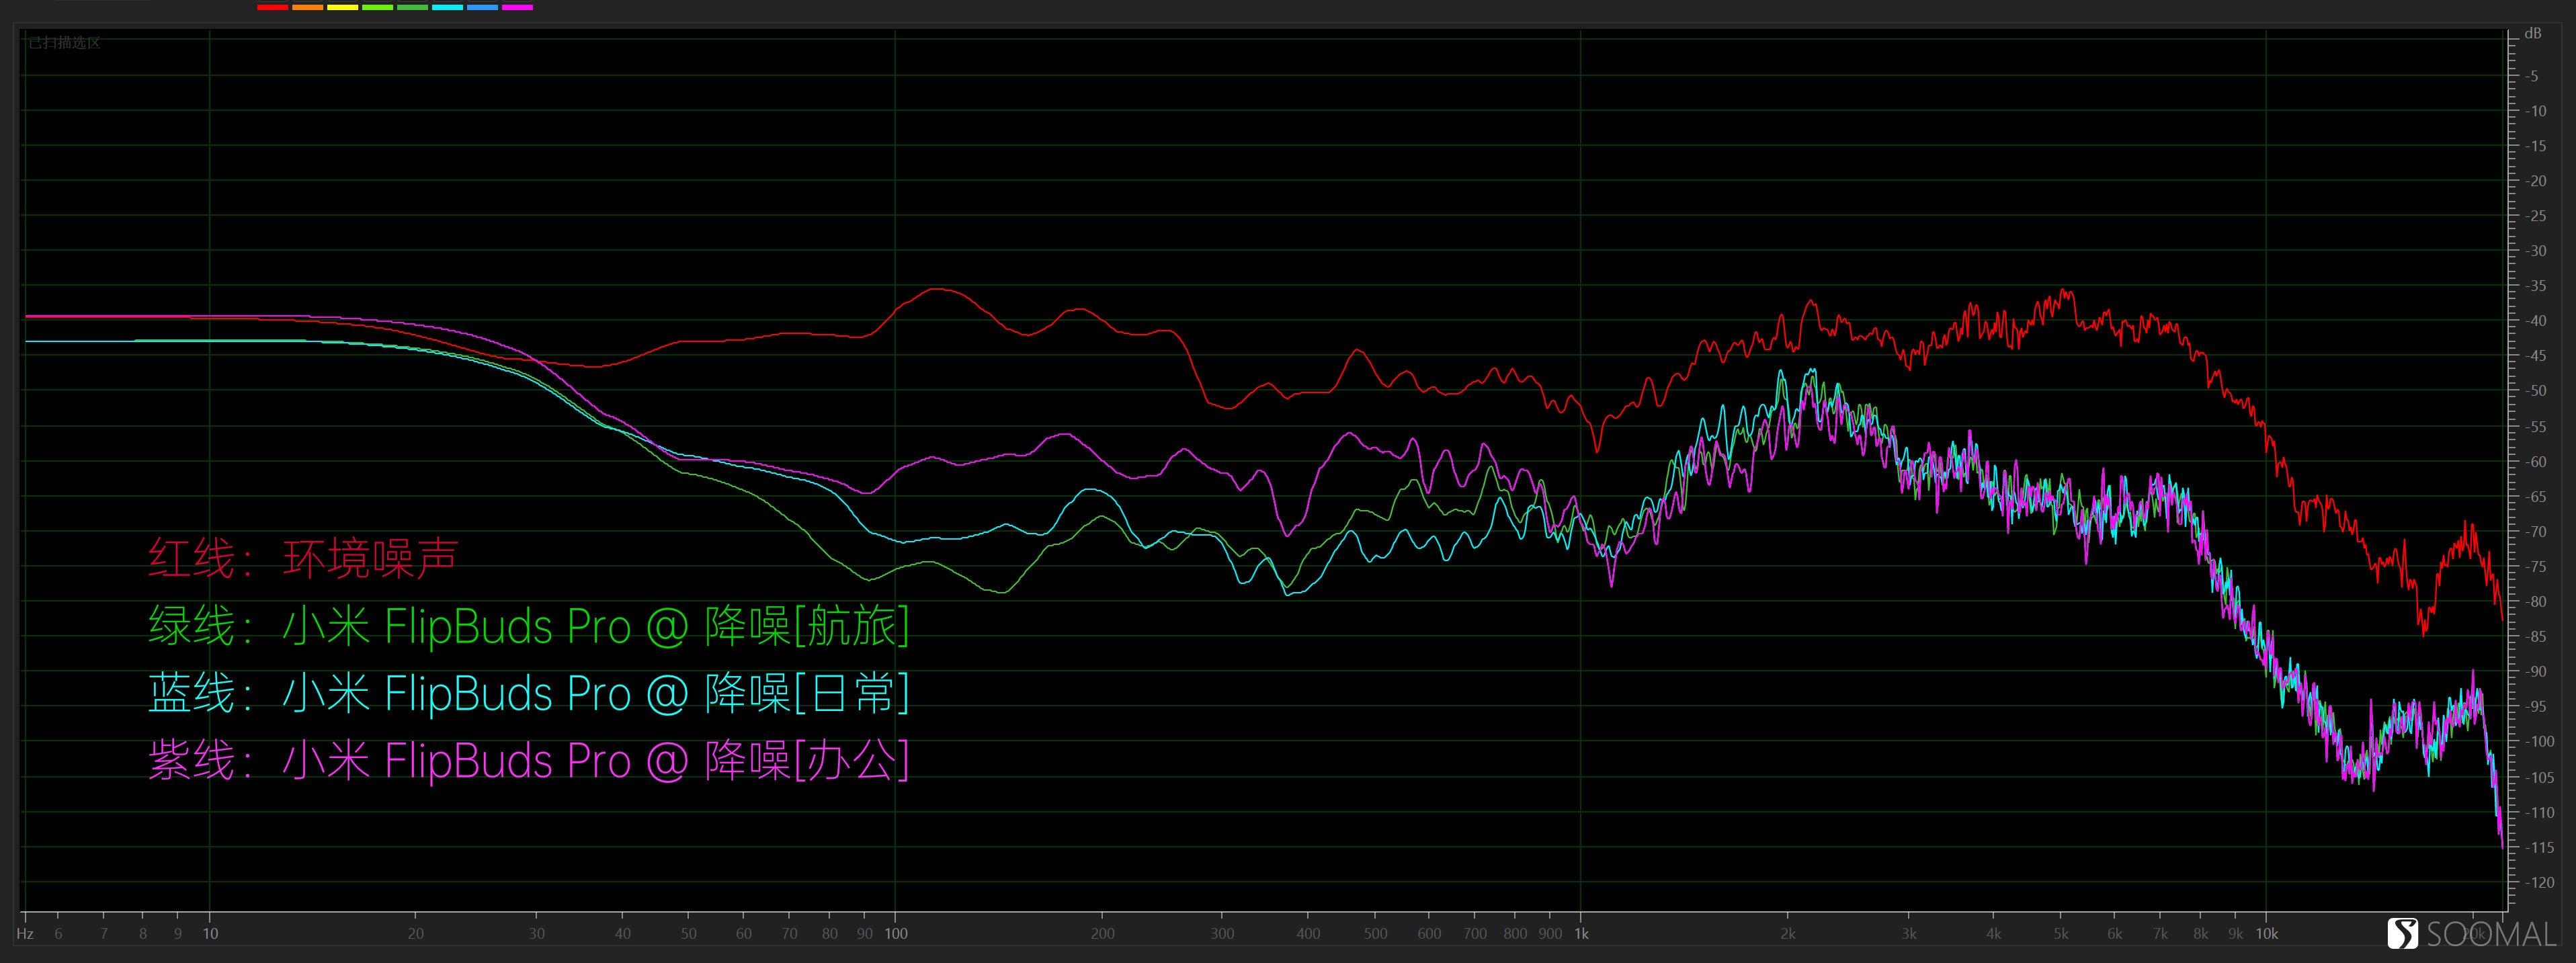 xiaomi 小米 FlipBuds Pro 蓝牙真无线主动降噪耳机测评报告 「SOOMAL」